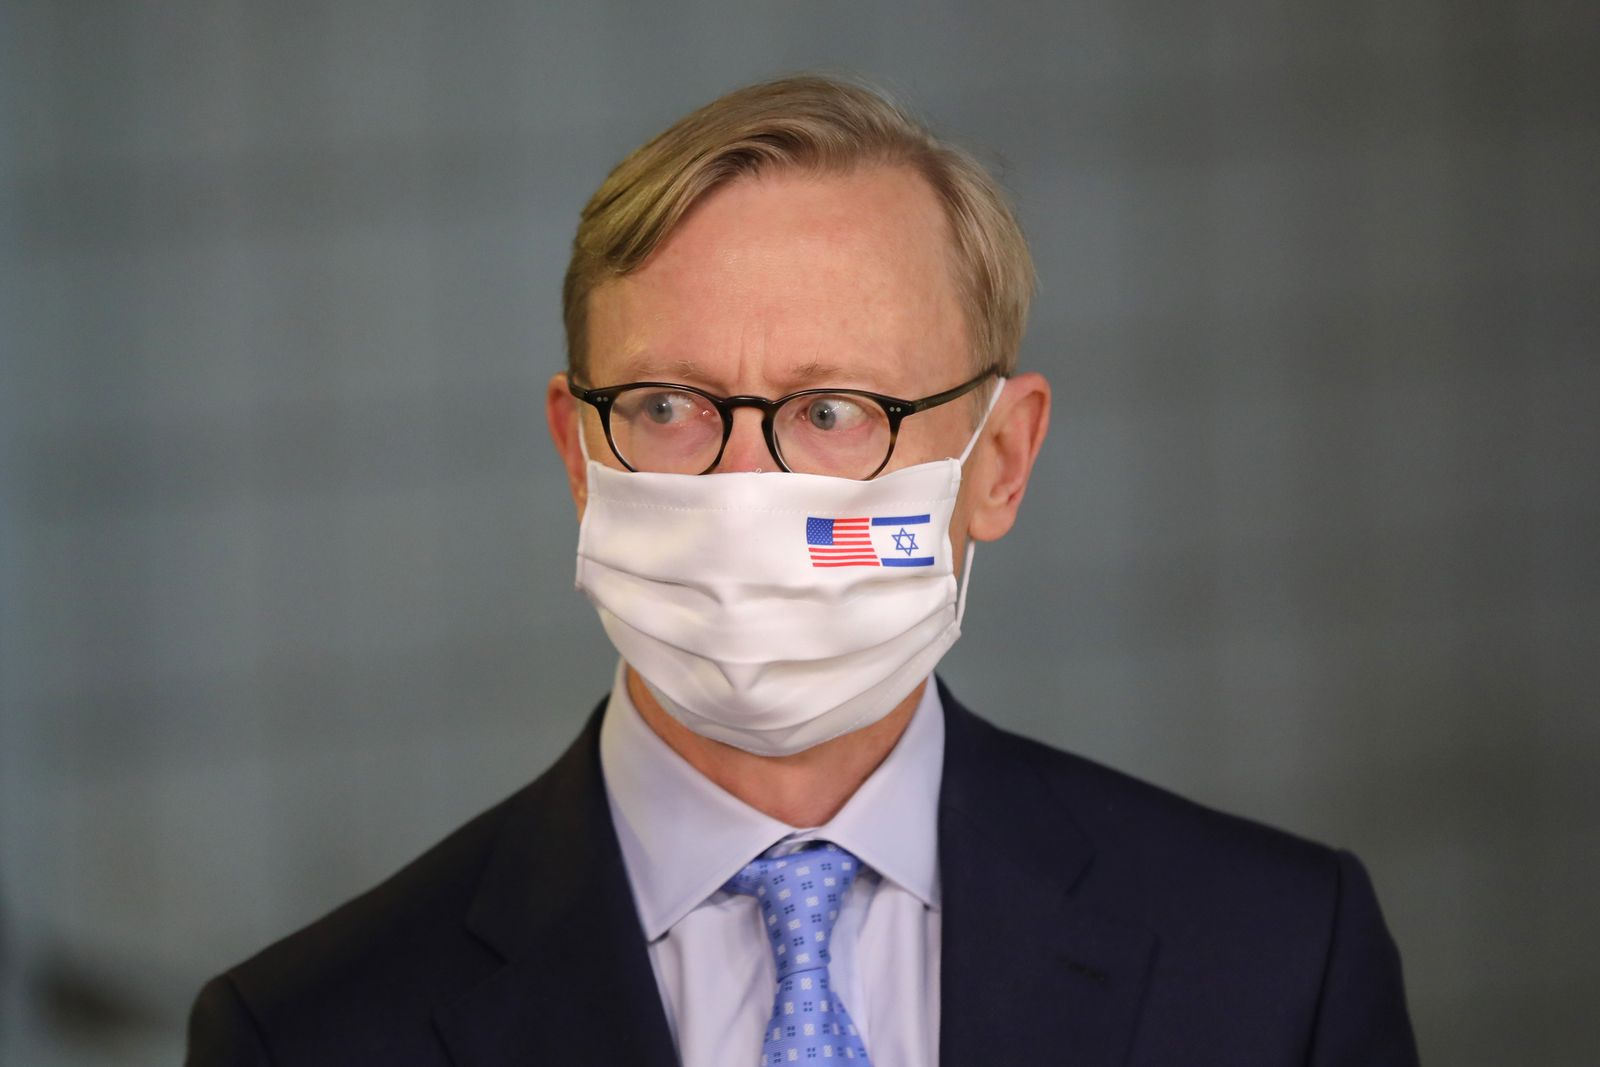 US special representative for Iran Brian Hook resigns, Jerusalem - 30 Jun 2020